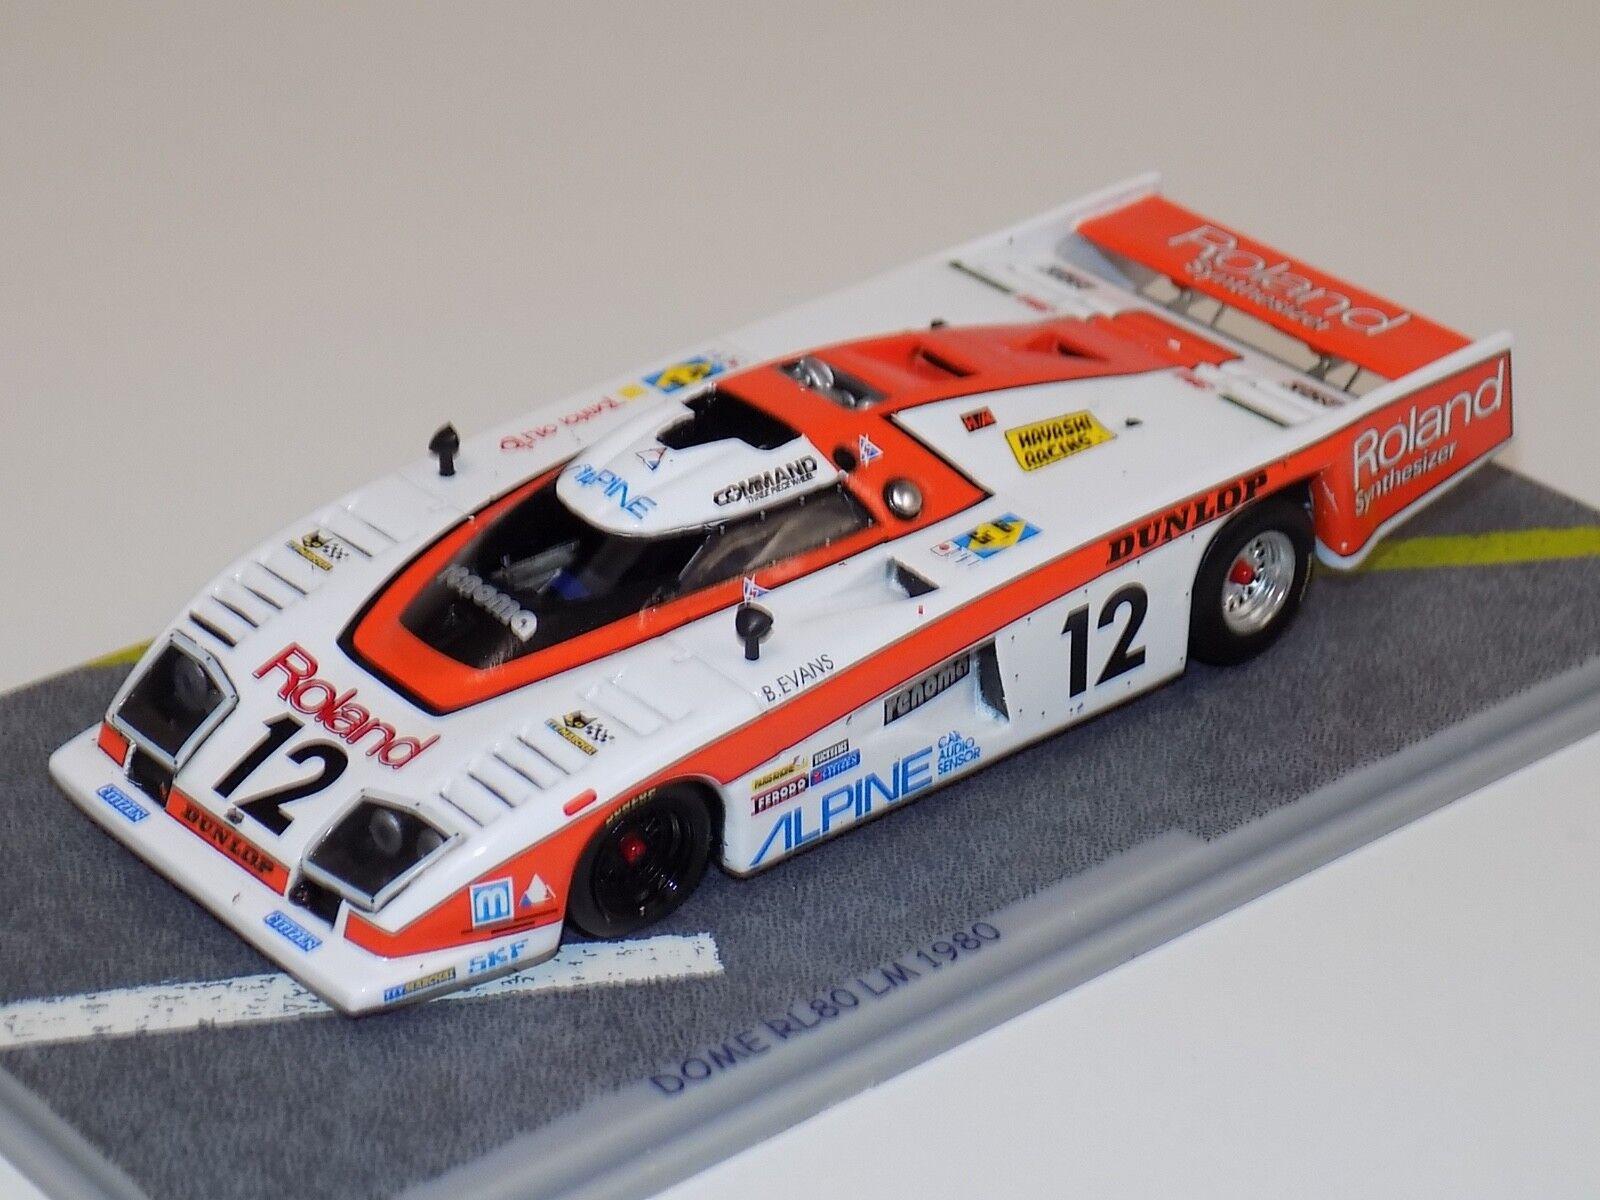 1 43 Bizarre DOME RL80 Car  12 1980 24 Hours of LeMans  BZ11